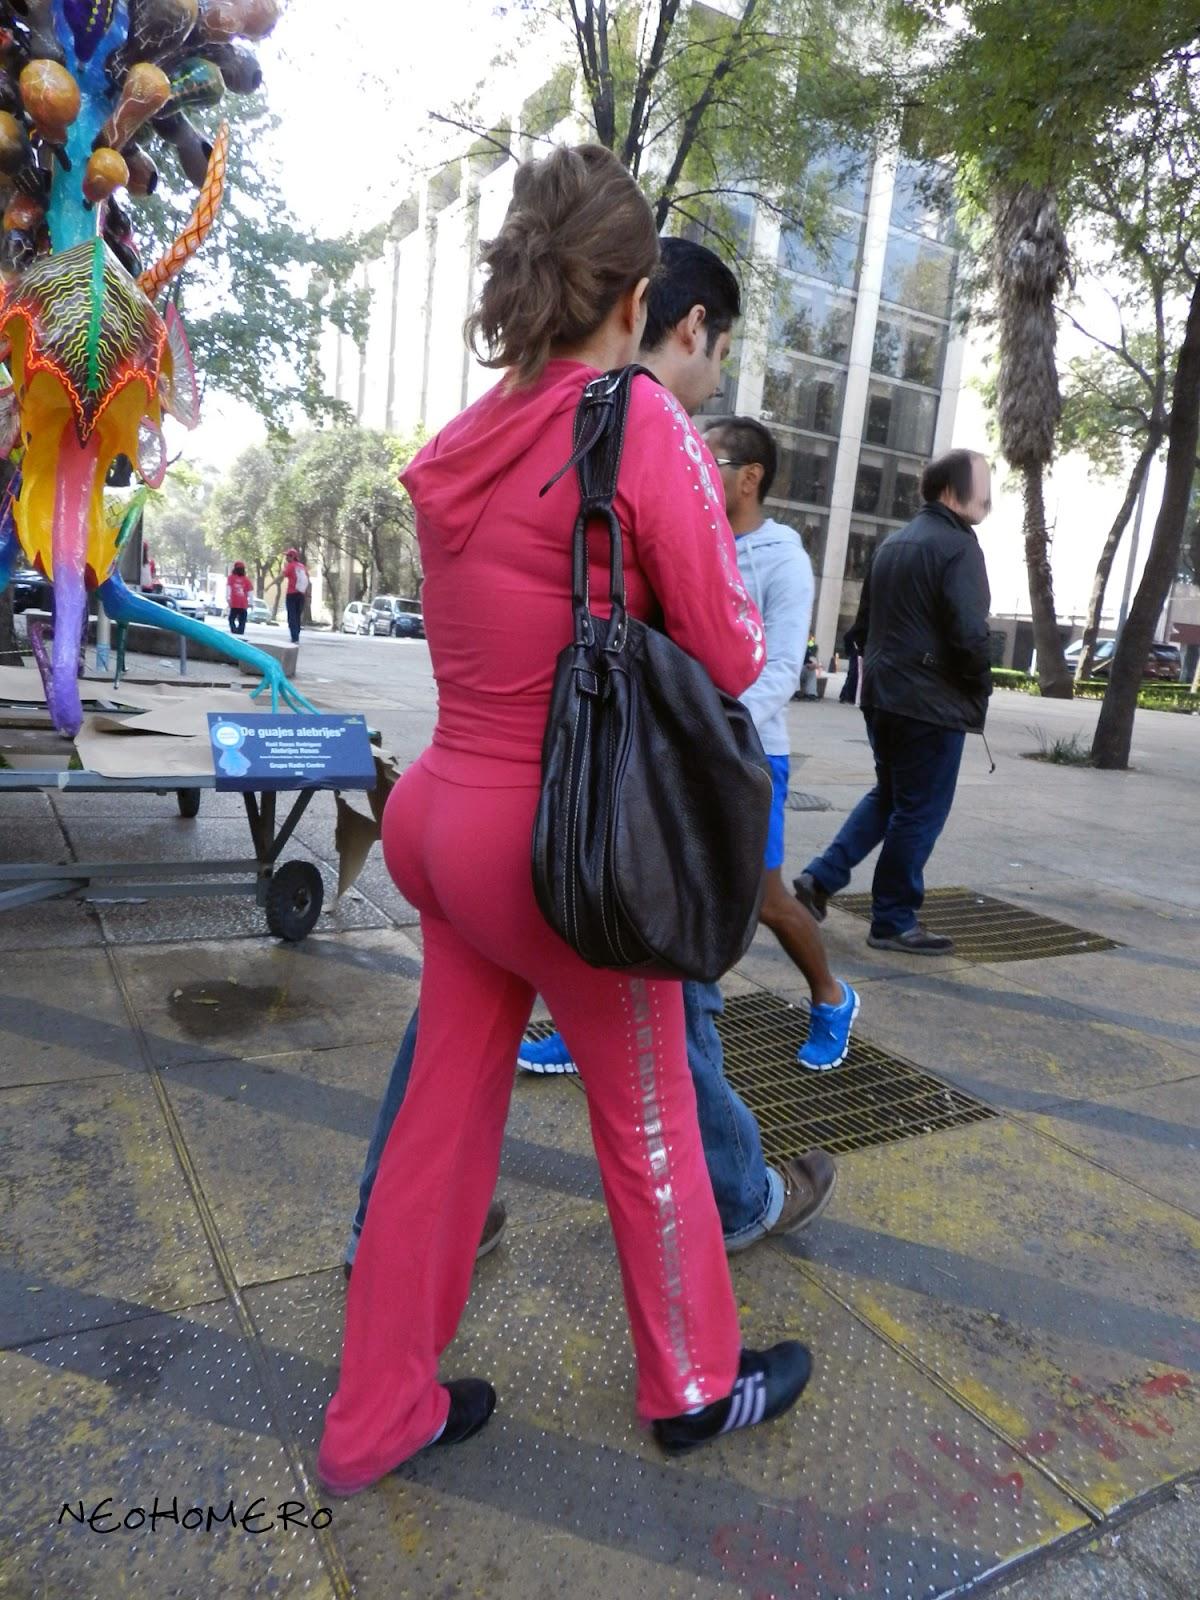 saint inigoes milf women Hot girls: st inigoes, md classic thong $1399: hot girls: st inigoes, md dog t-shirt $2099: hot girls: st inigoes, md fitted t-shirt $2399.